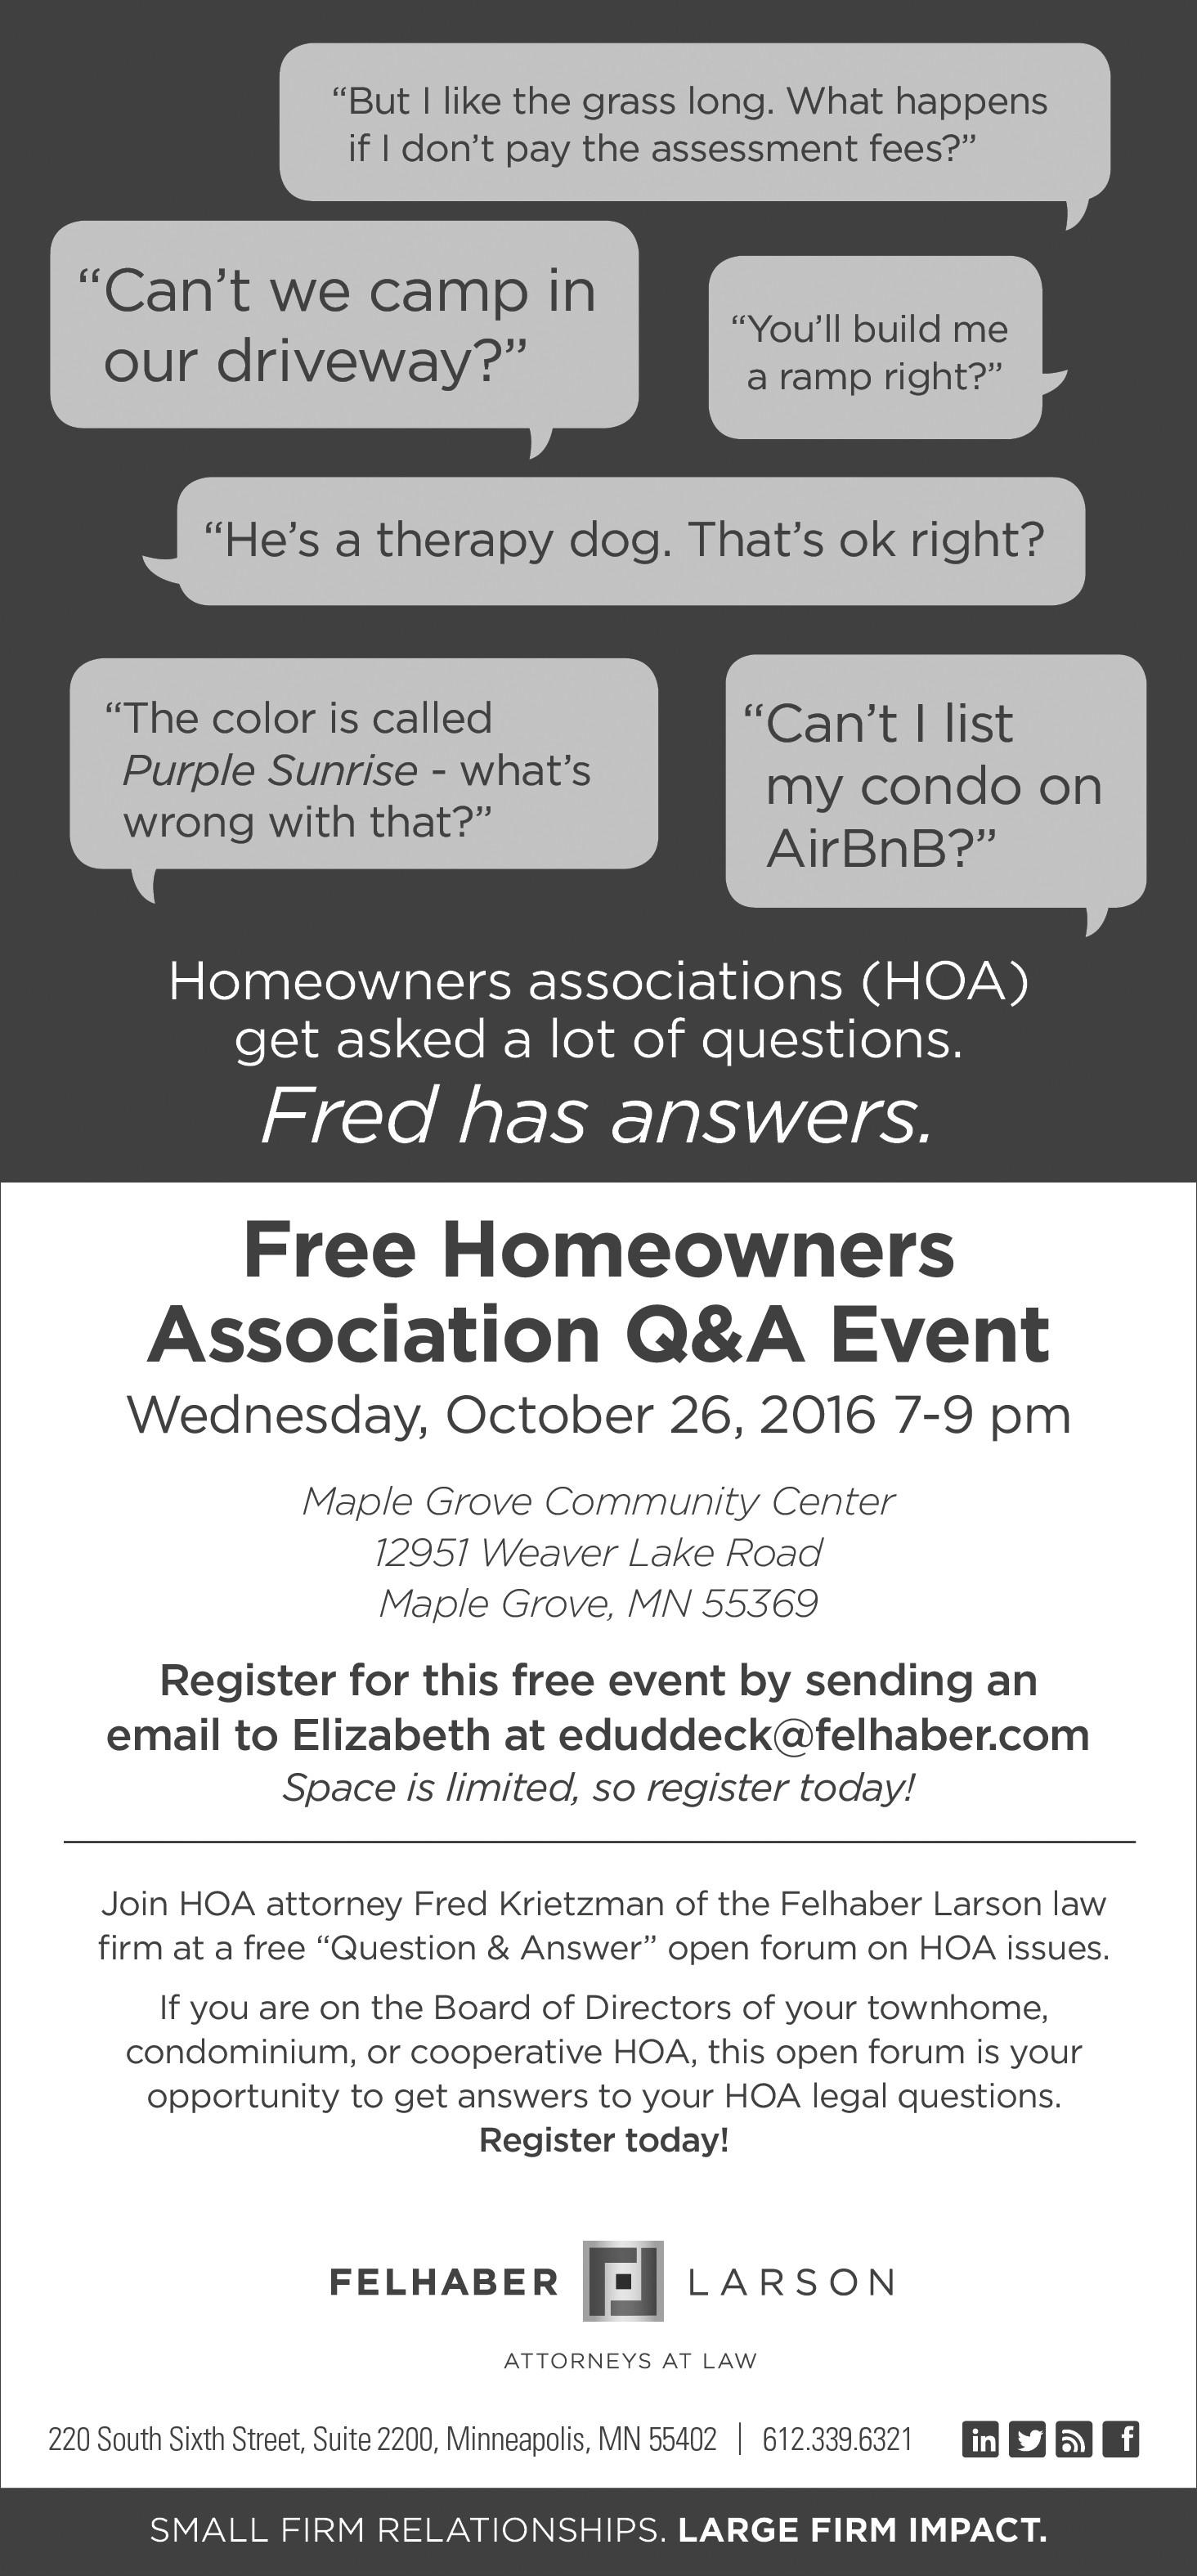 Fred Krietzman Offers Free Homeowners Ass'n Q & A - Felhaber